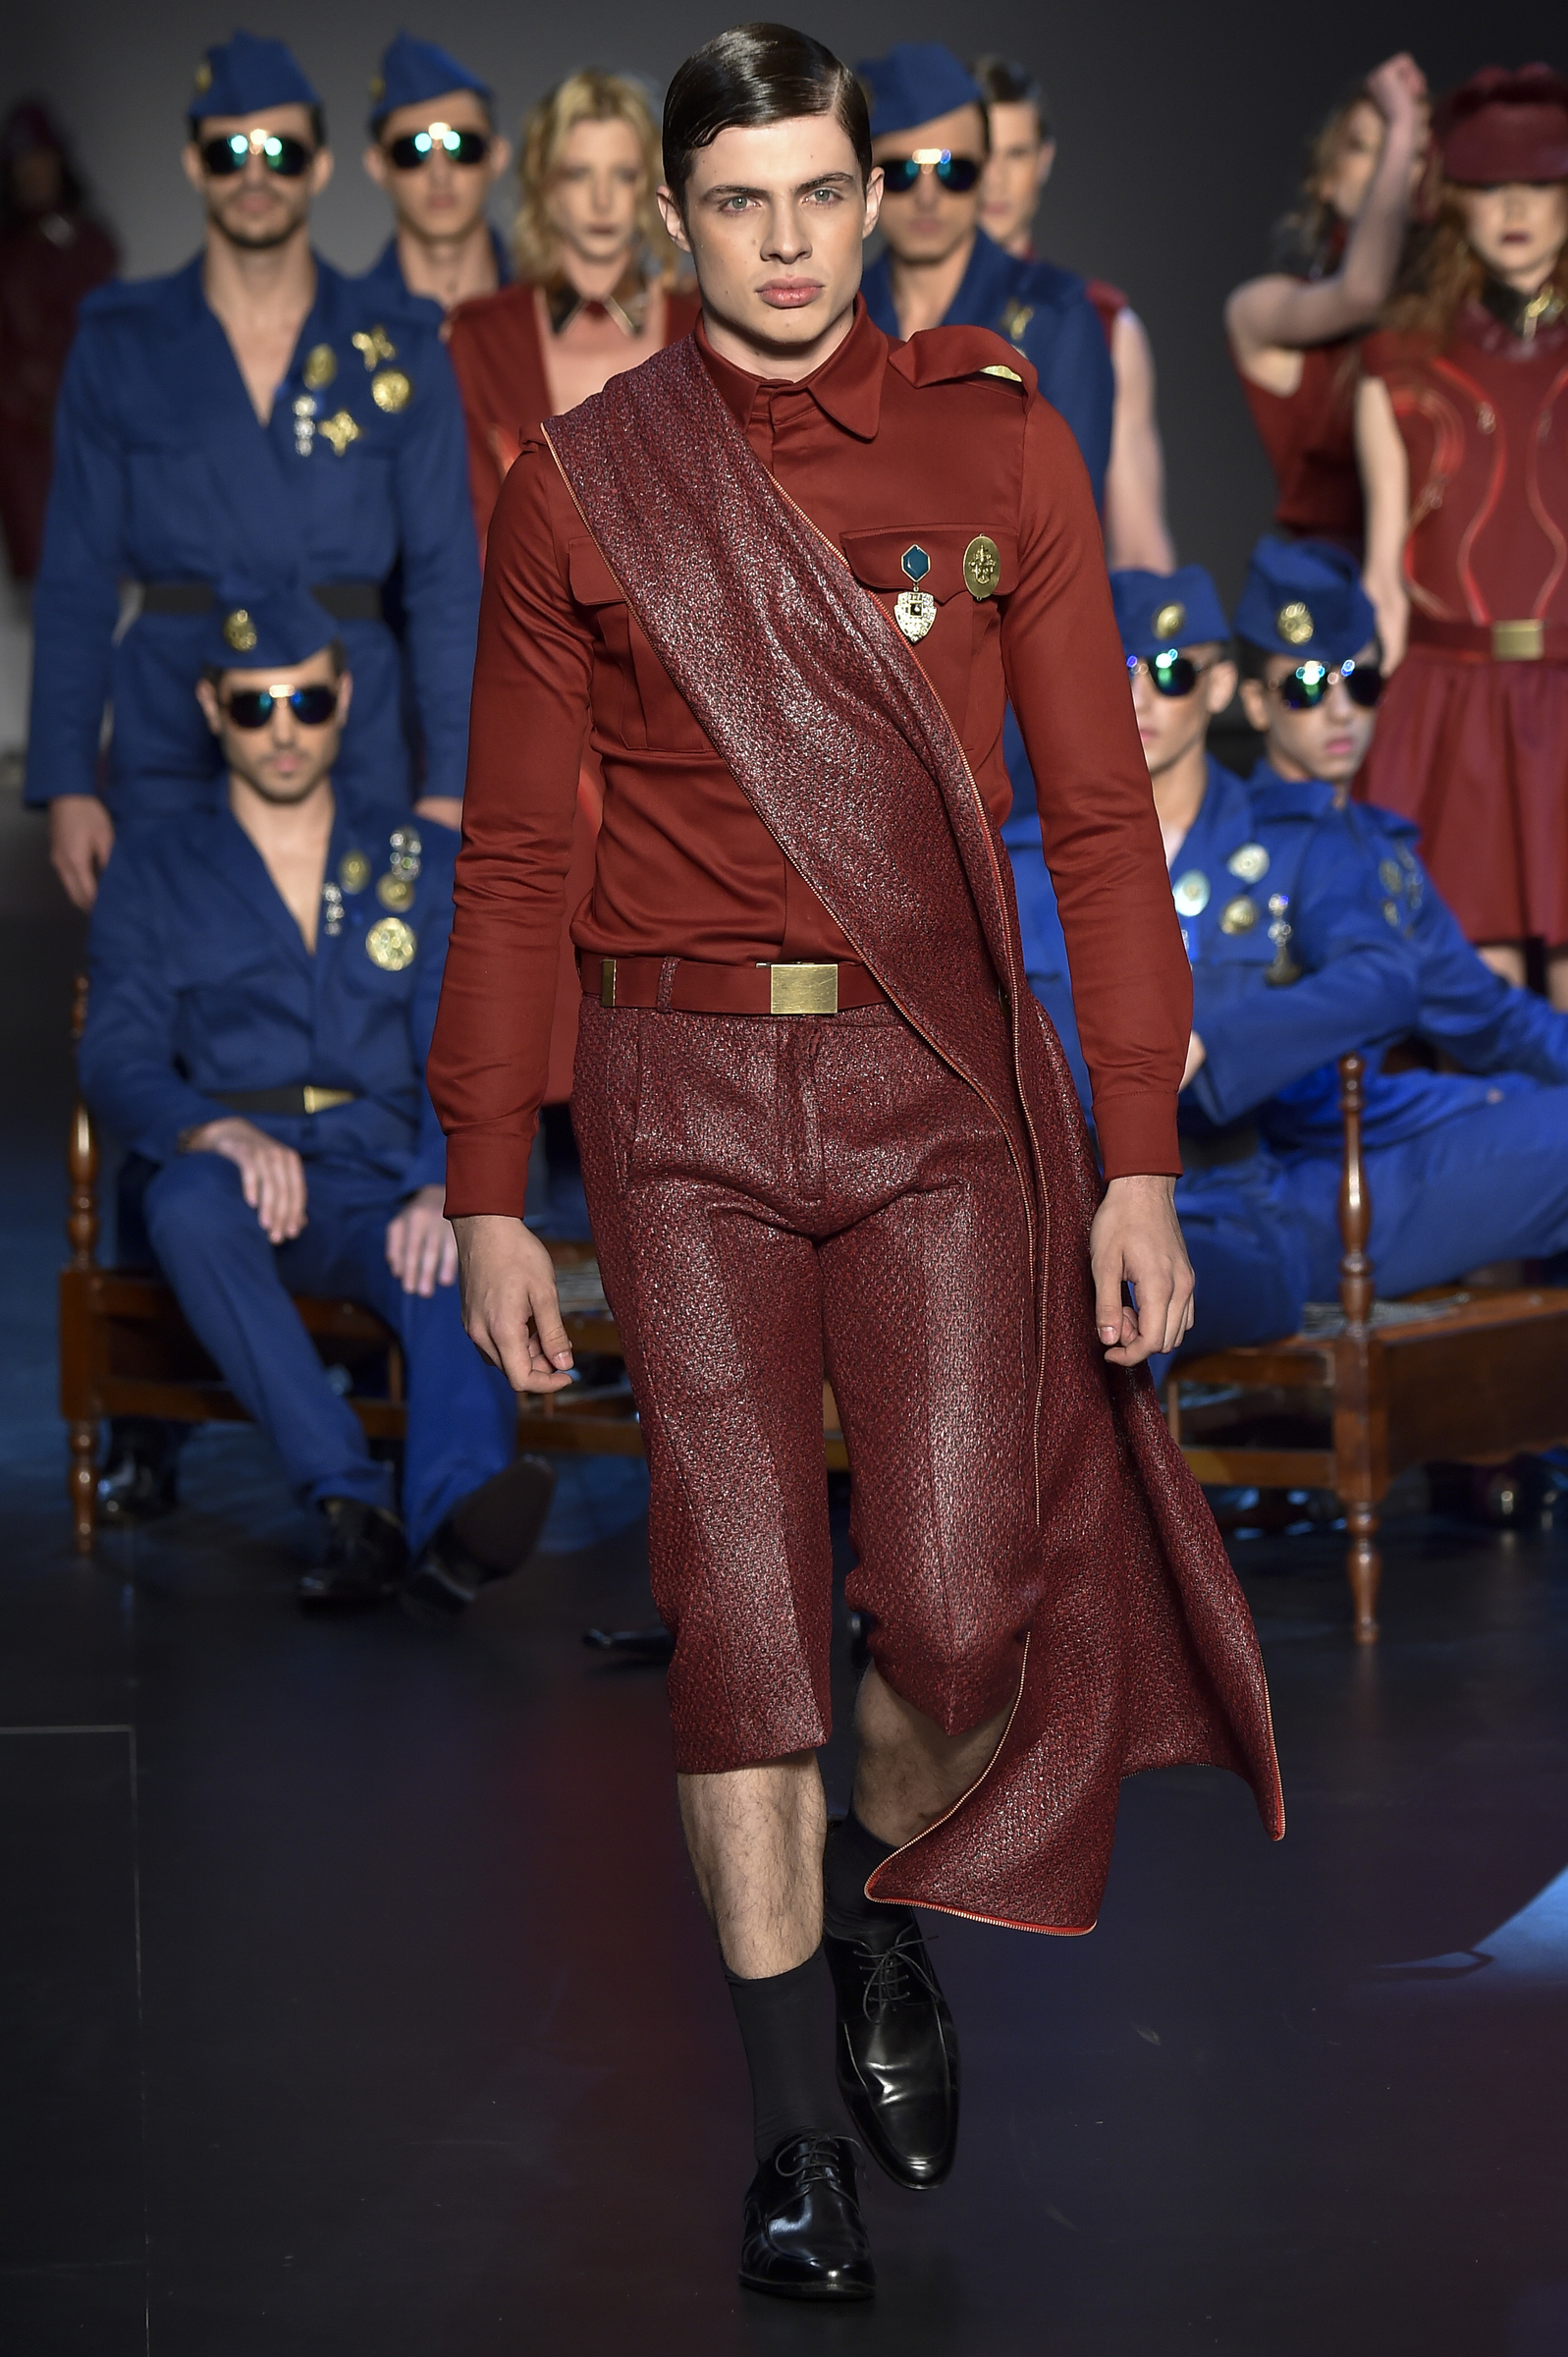 Arnaldo Ventura, inverno 2016, moda masculina, casa de criadores, roupa masculina, estilo masculino, menswear, fashion, fashion blogger, alex cursino, moda sem censura, 3